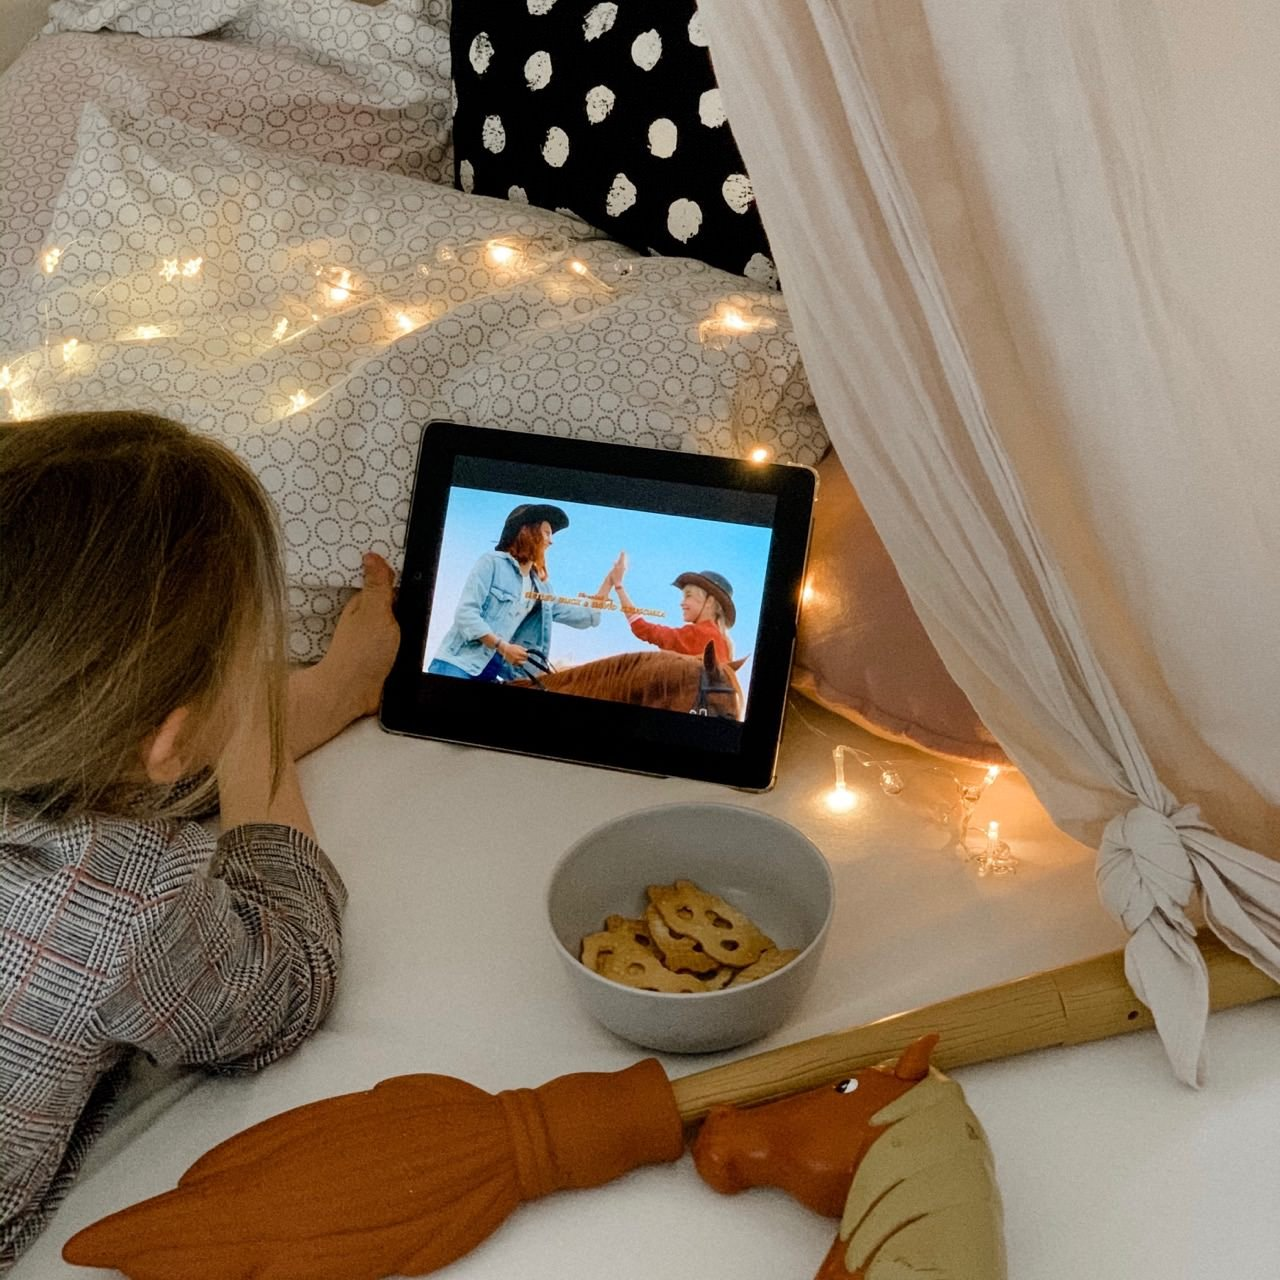 Coronaalltag was tun mit Kindern beschäftigungstipps mamawahnsinn